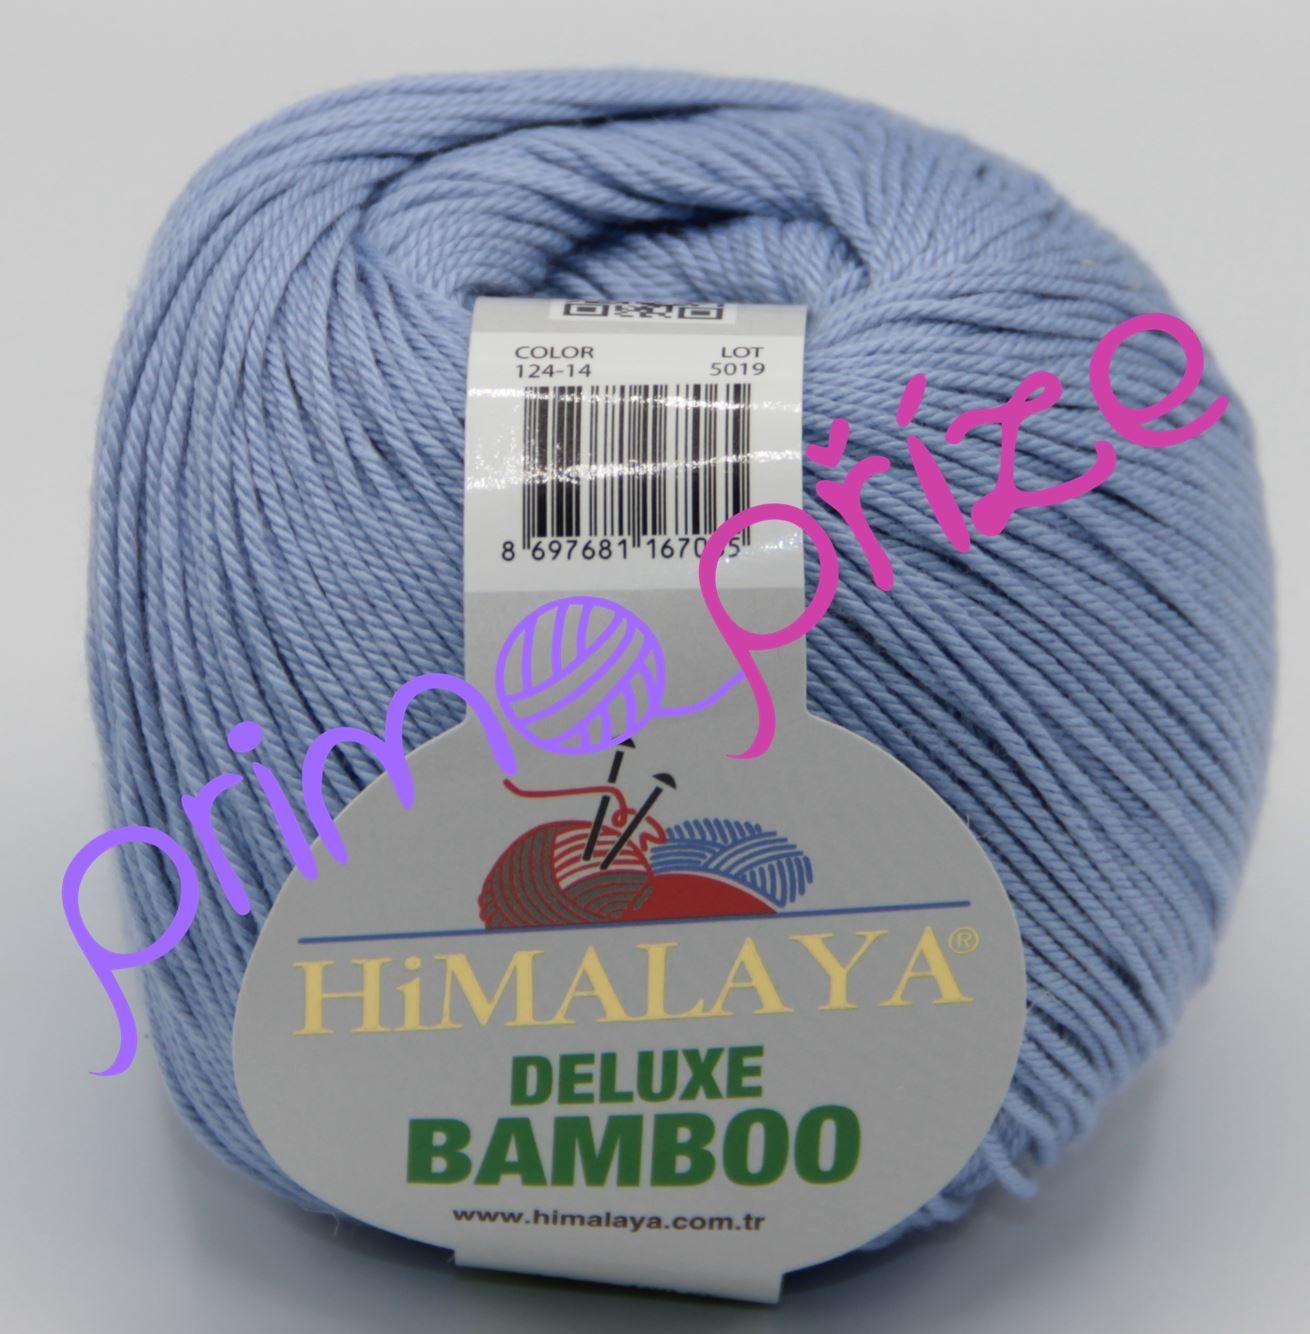 HIMALAYA Deluxe Bamboo 124-14 modro-fialová